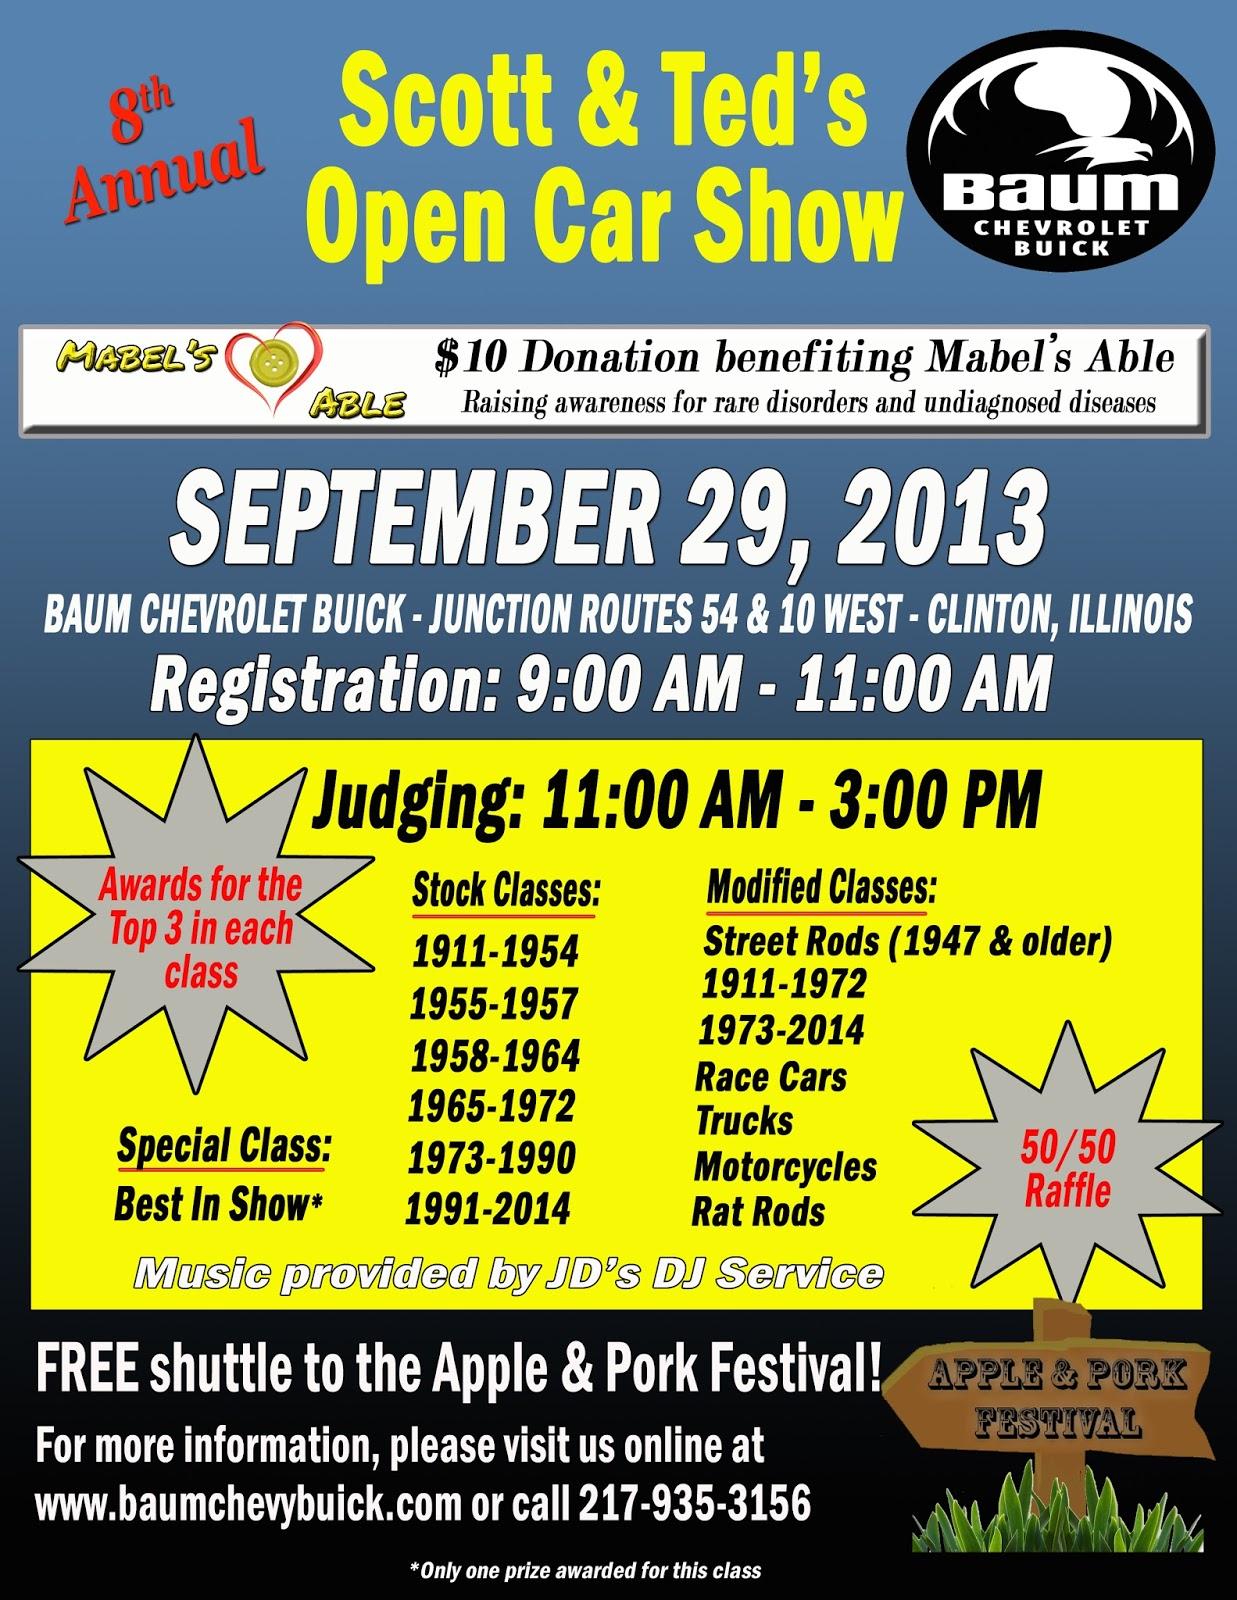 Baum Chevrolet Buick Car Show Details Announced